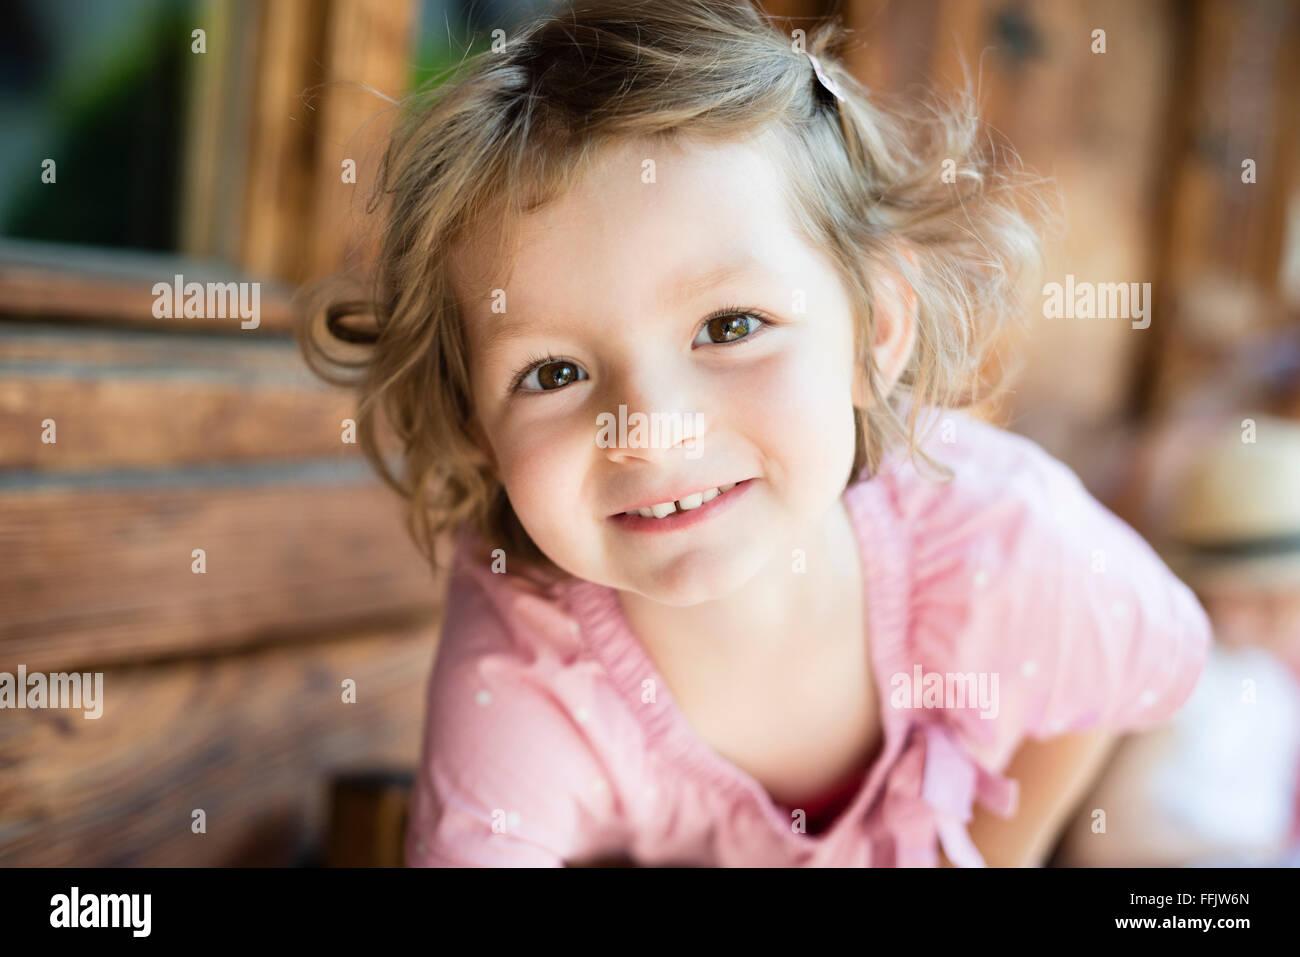 Retrato de niña con el pelo rubio Imagen De Stock